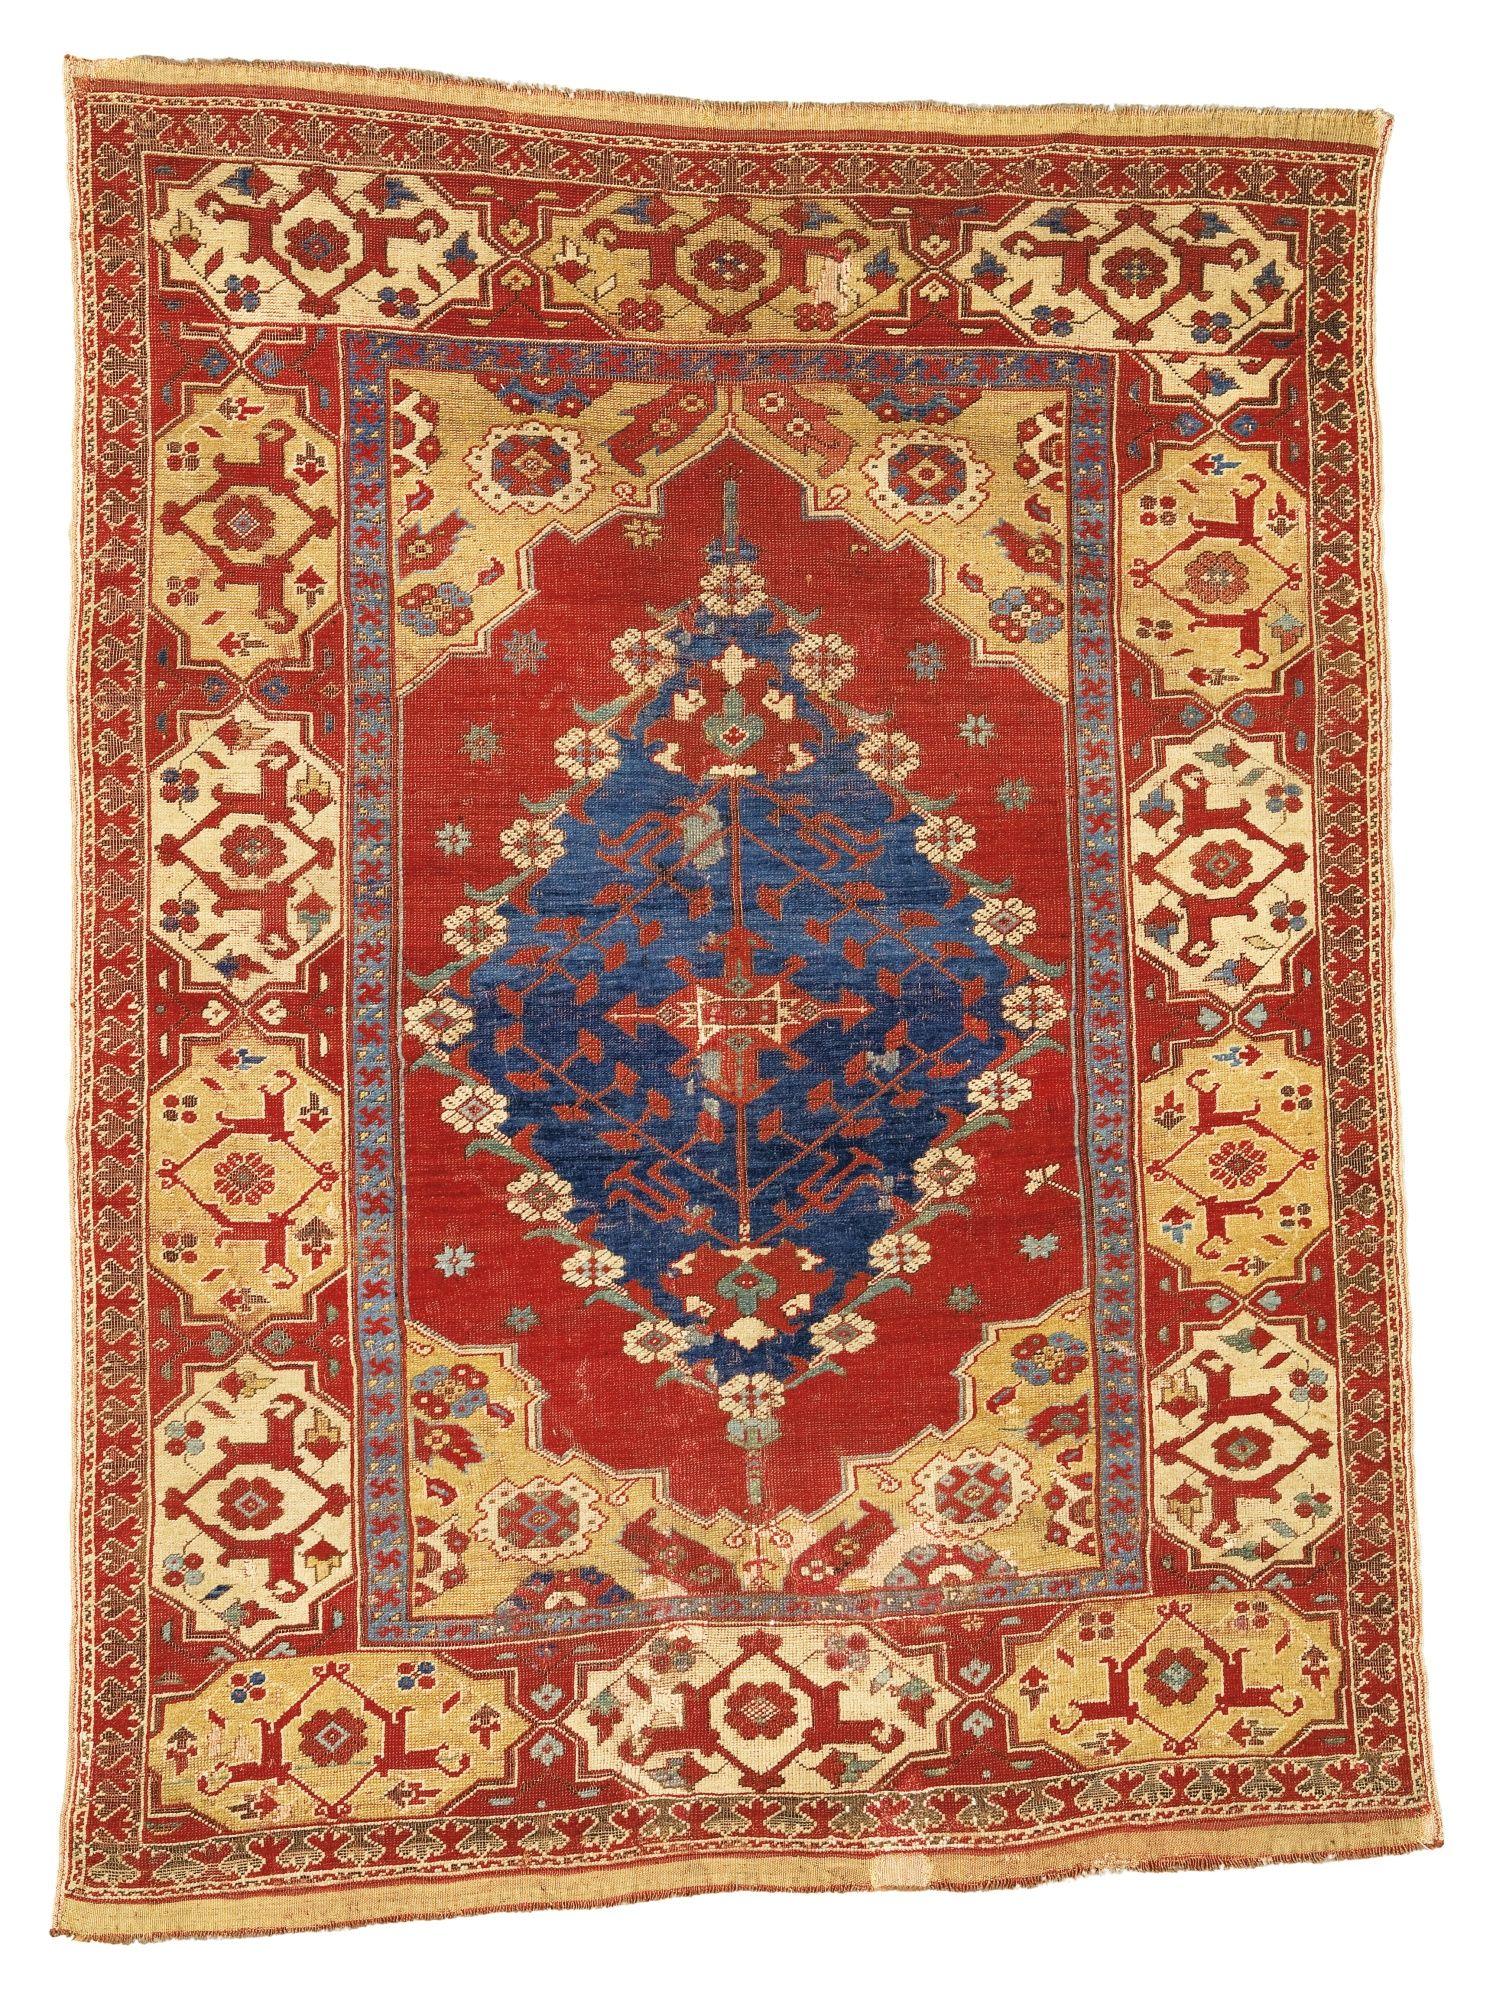 Lot 23 sothebys rug sale transylvanian rug west anatolia